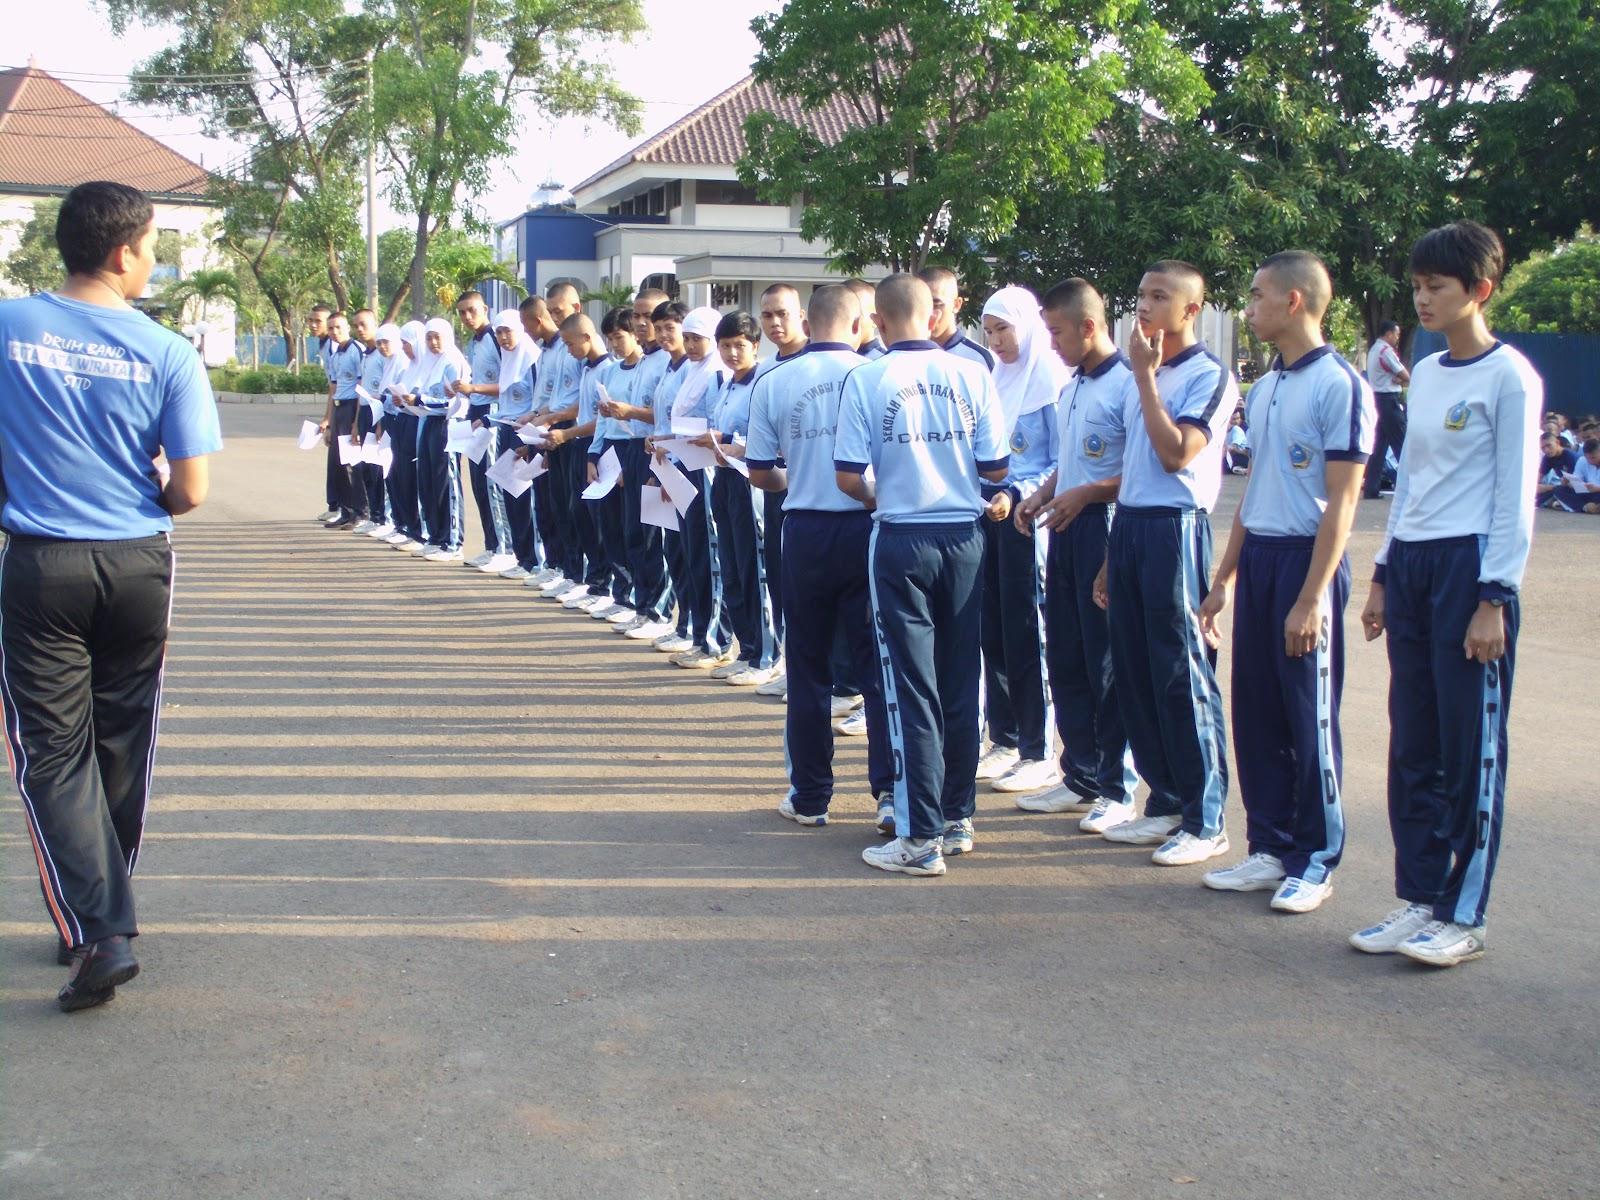 Suasana Ketika Pelaksanaan Test di Gedung Olahraga (GOR) STTD